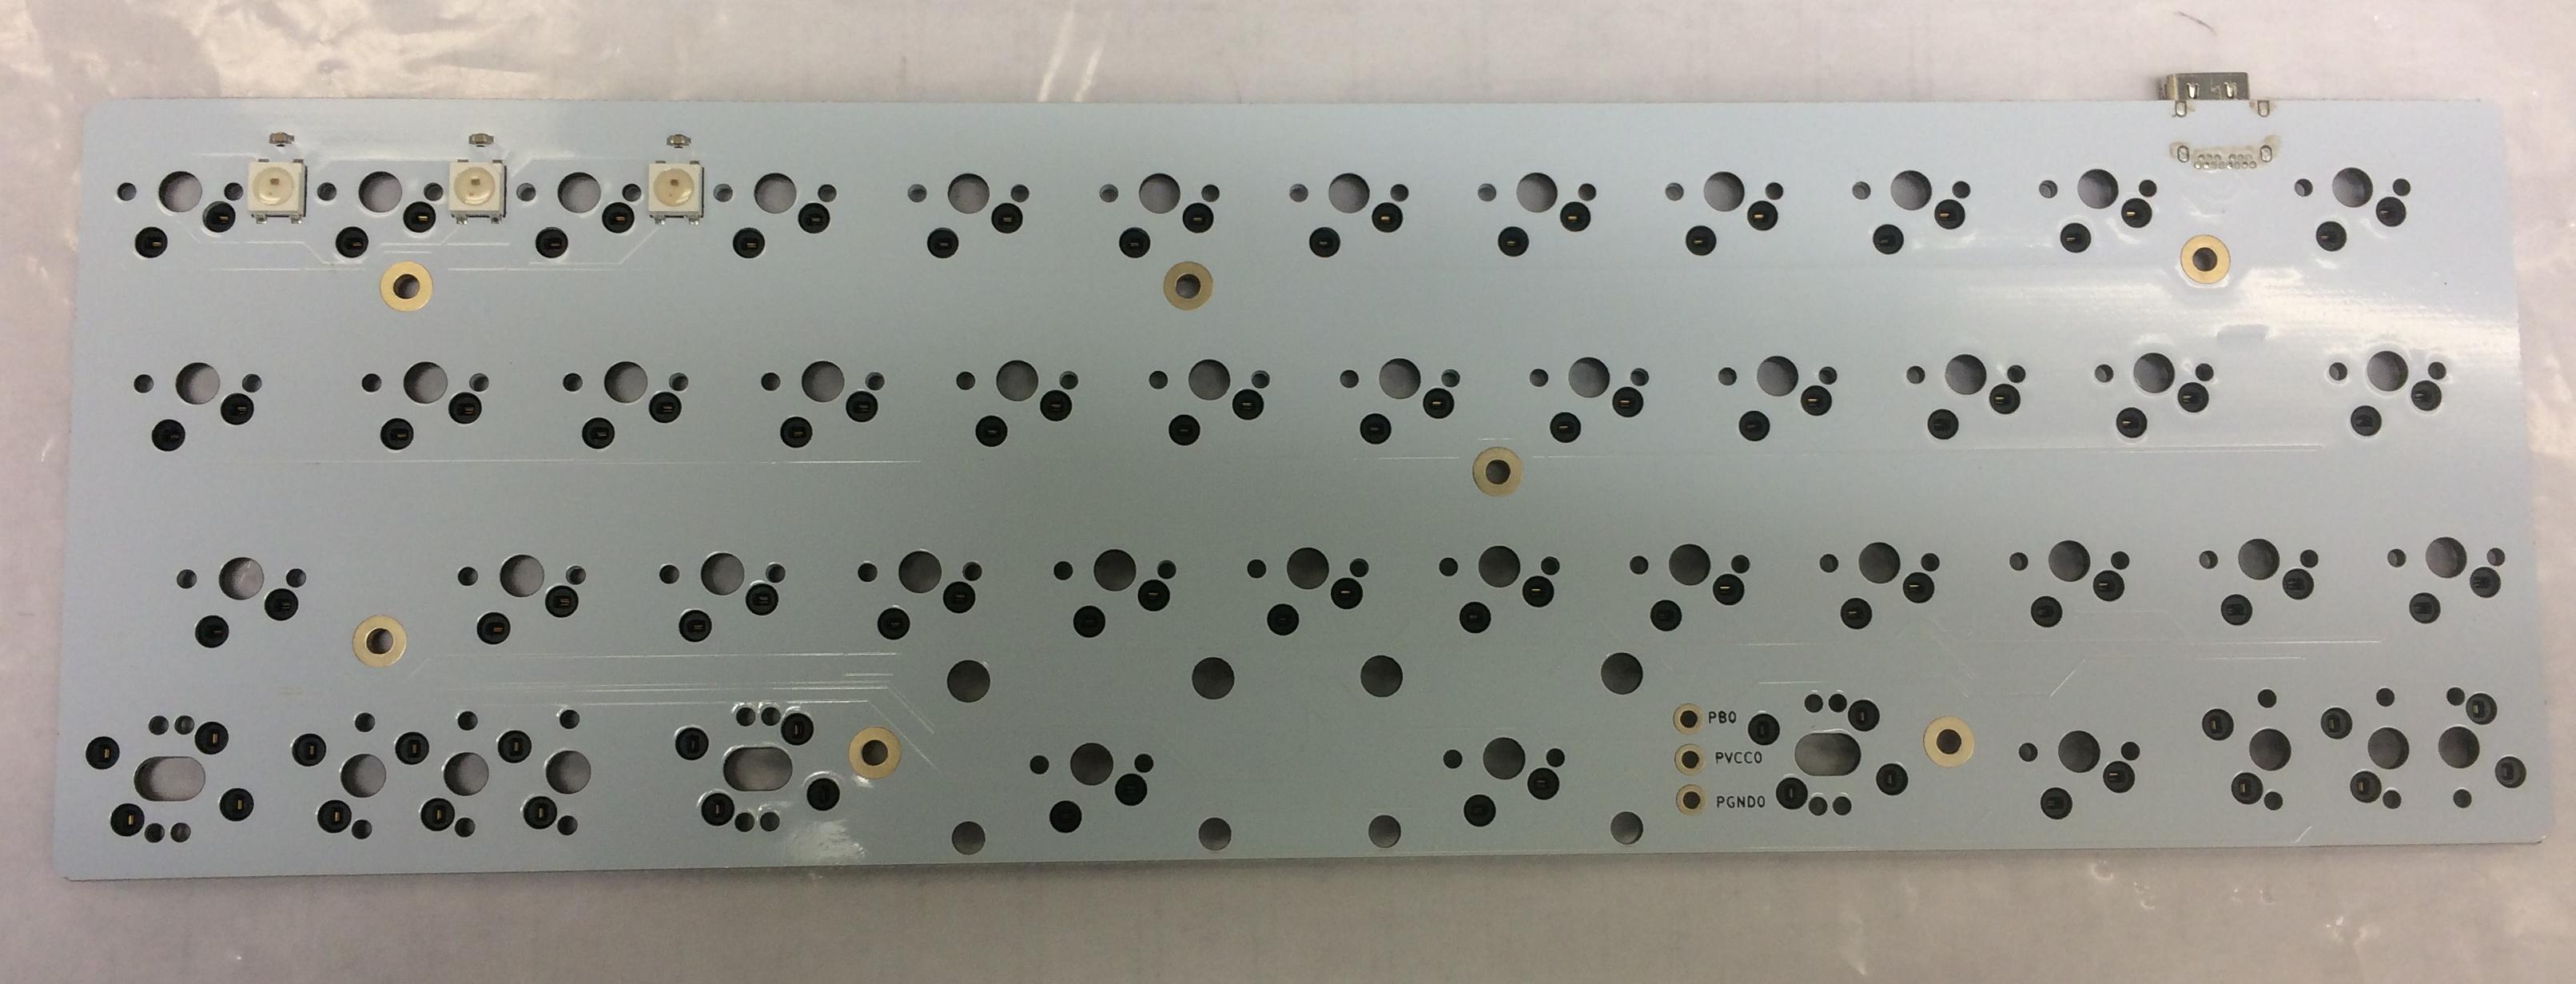 Front of the MiniVan HS Rev 1.1 PCB